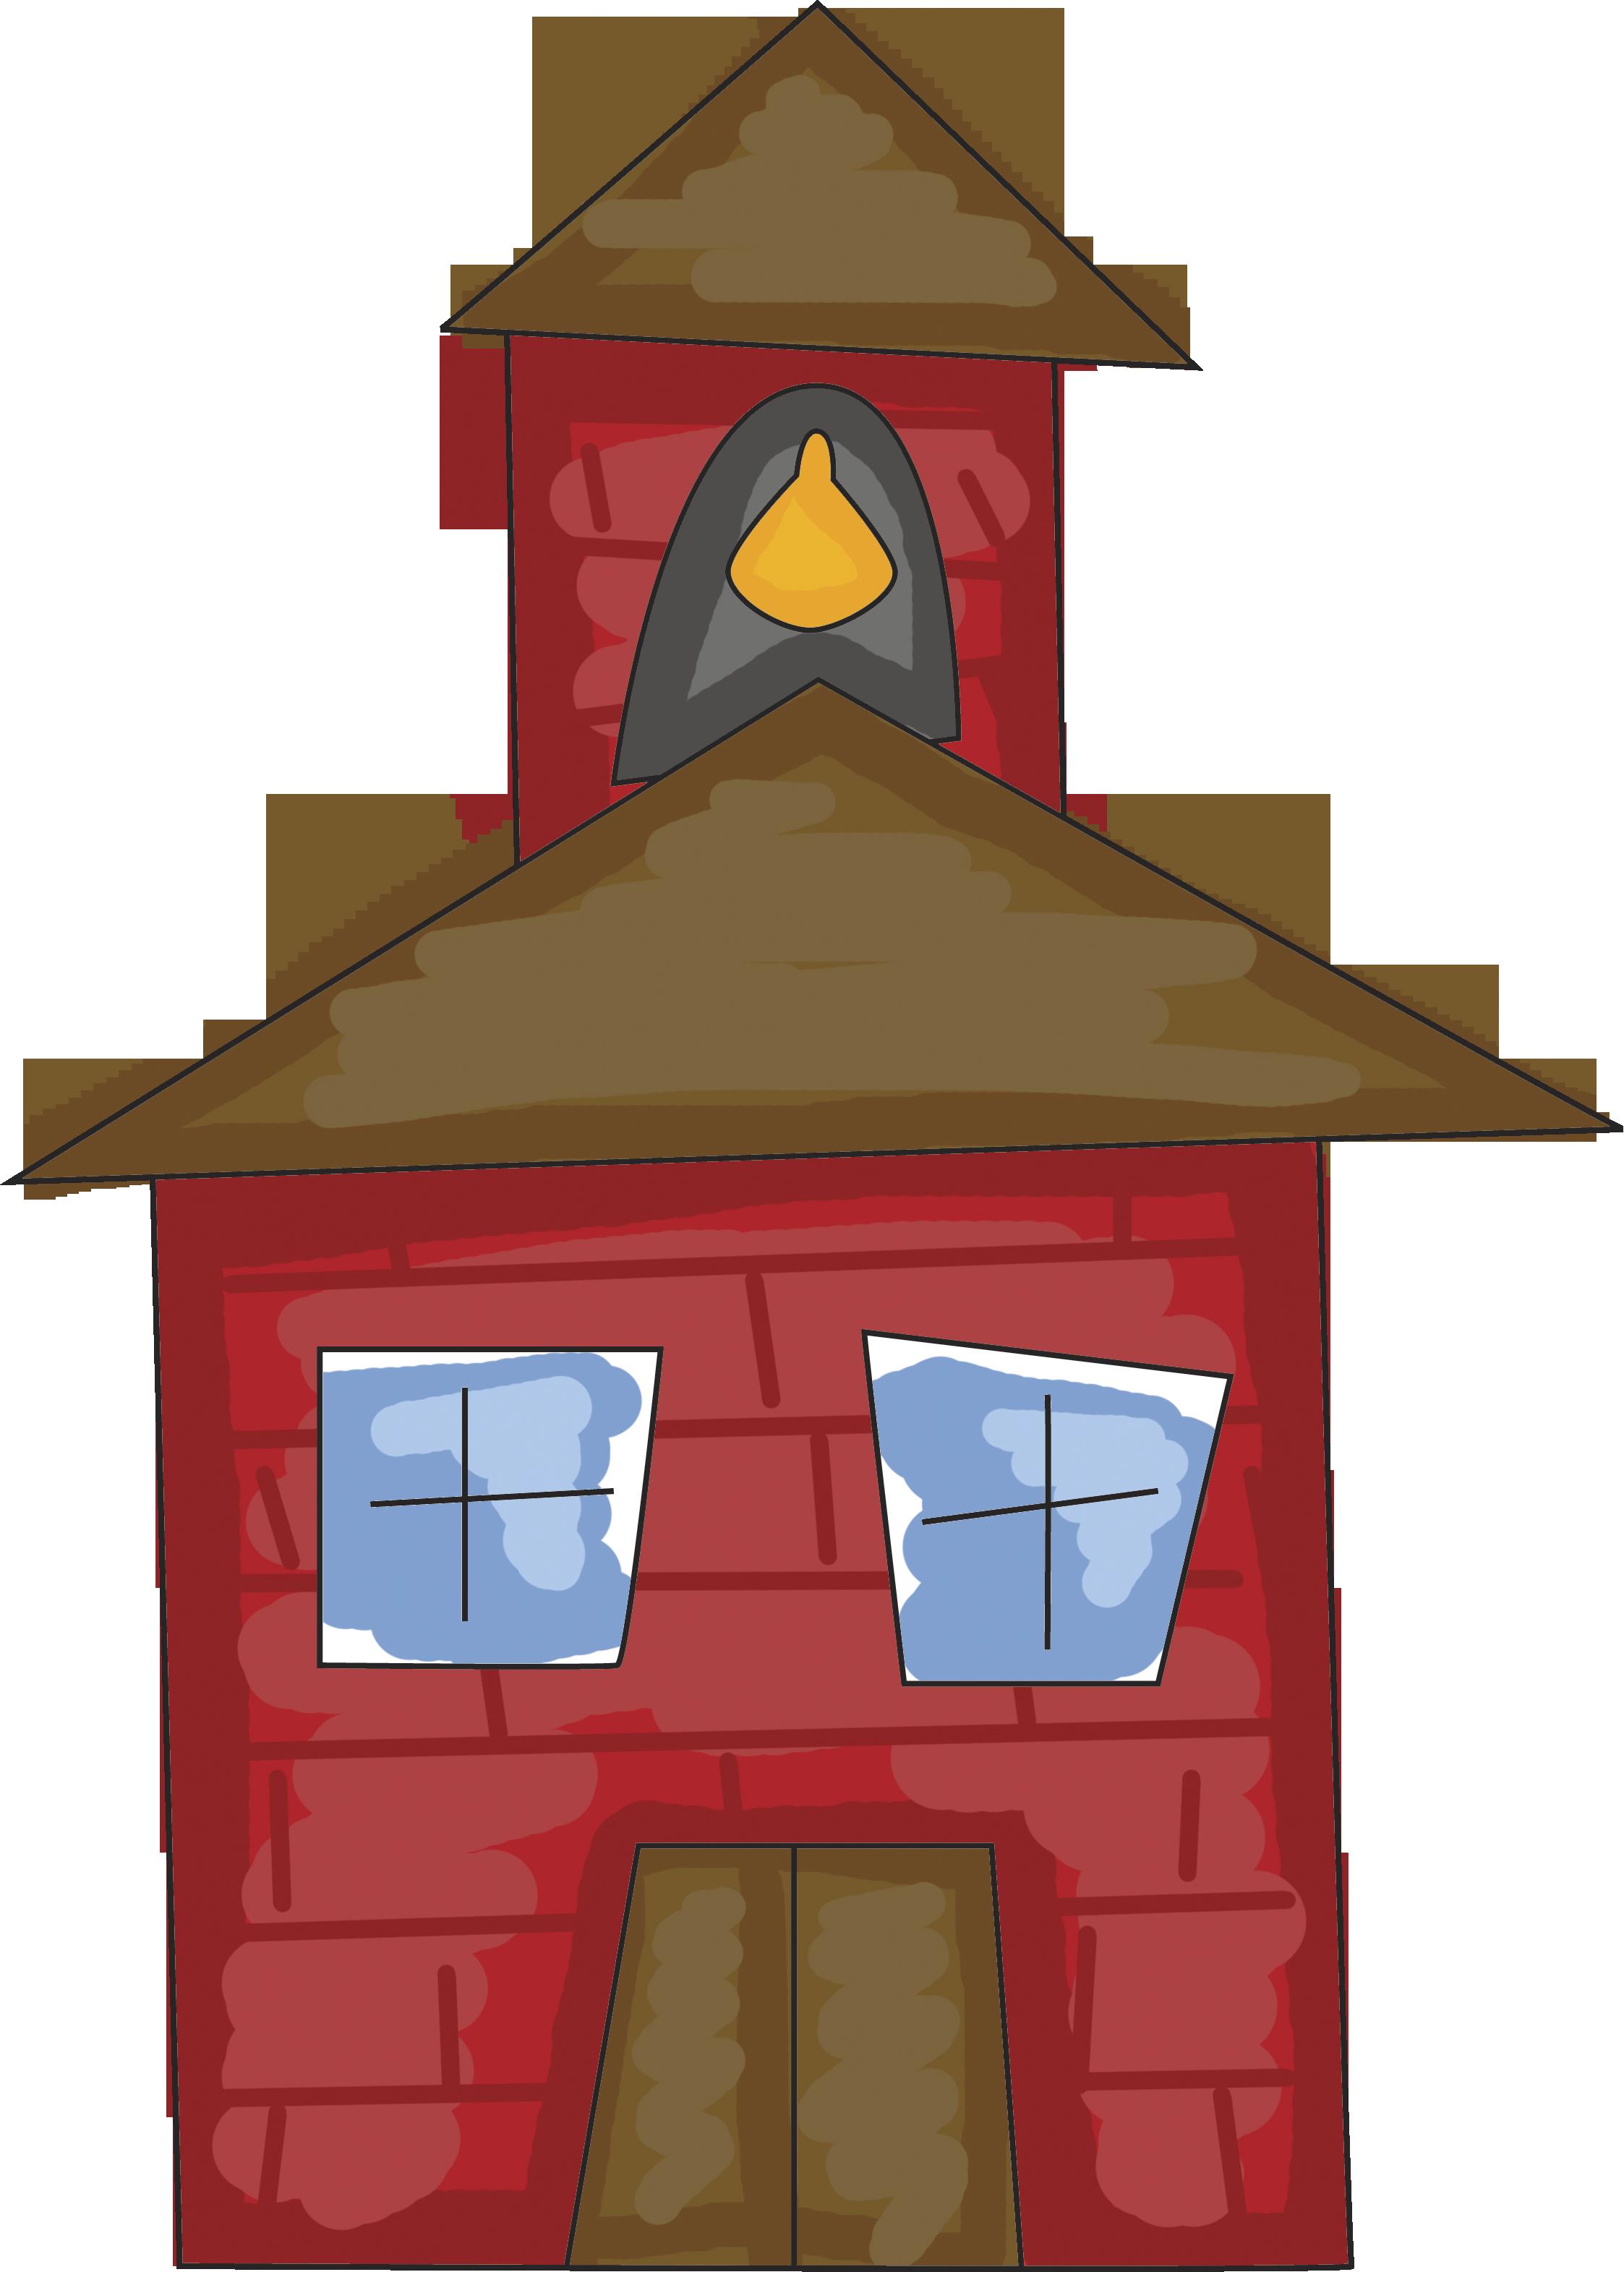 schoolhouse clipart school roof